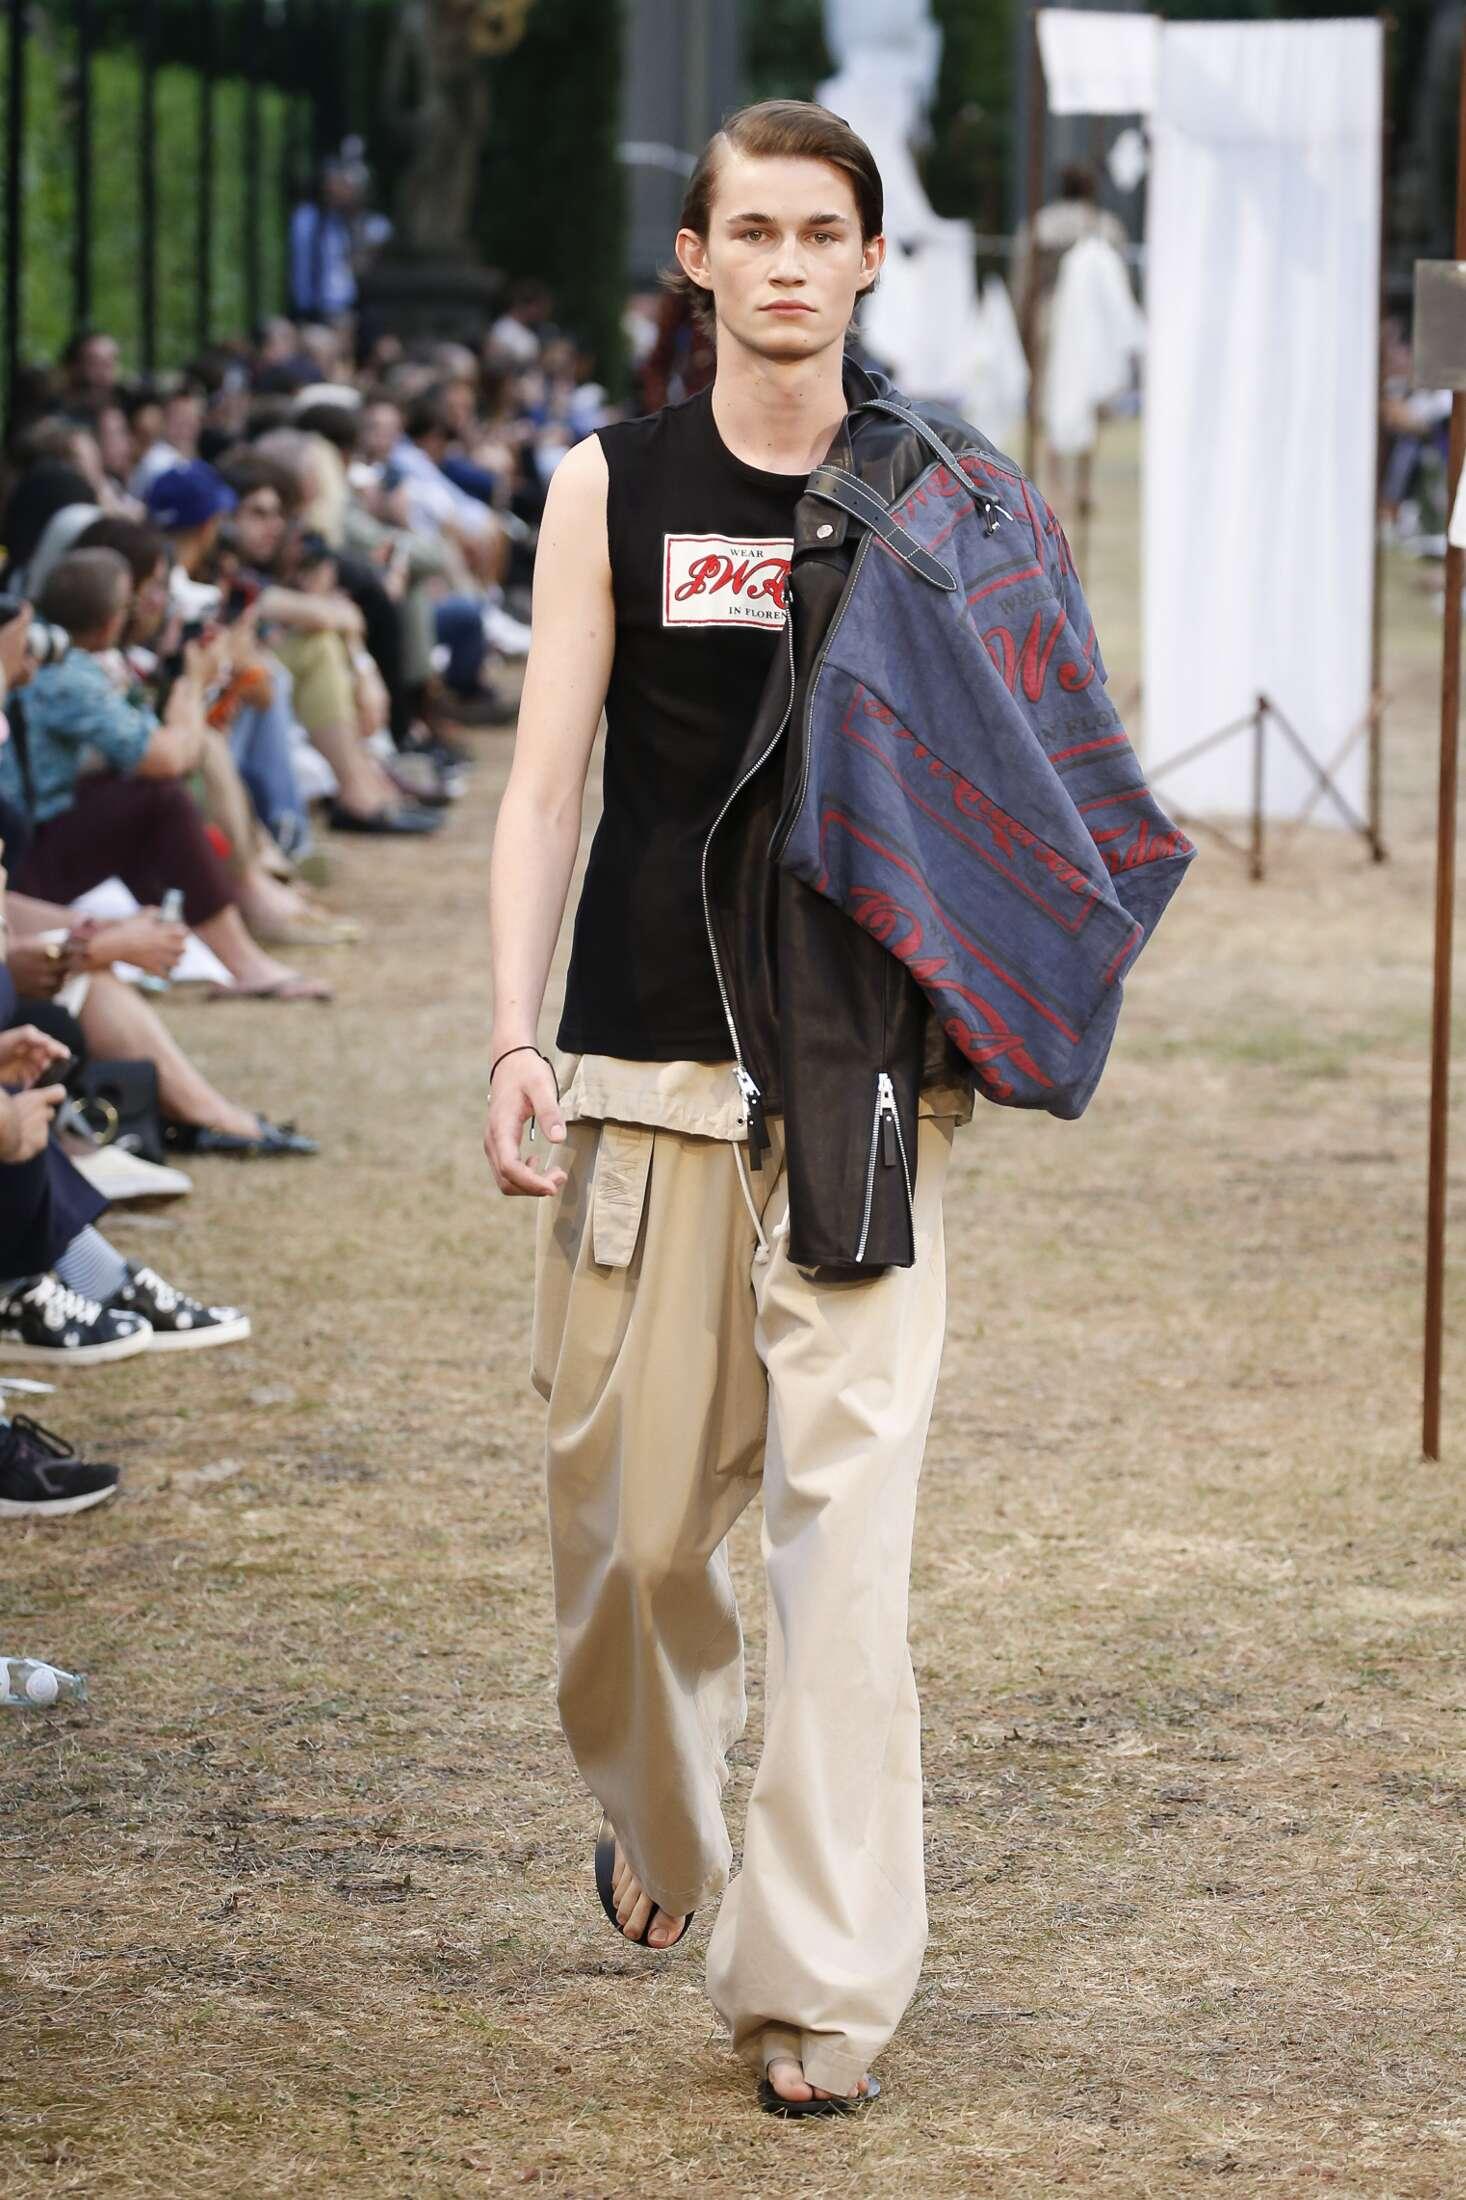 Man SS 2018 Fashion Show J.W. Anderson